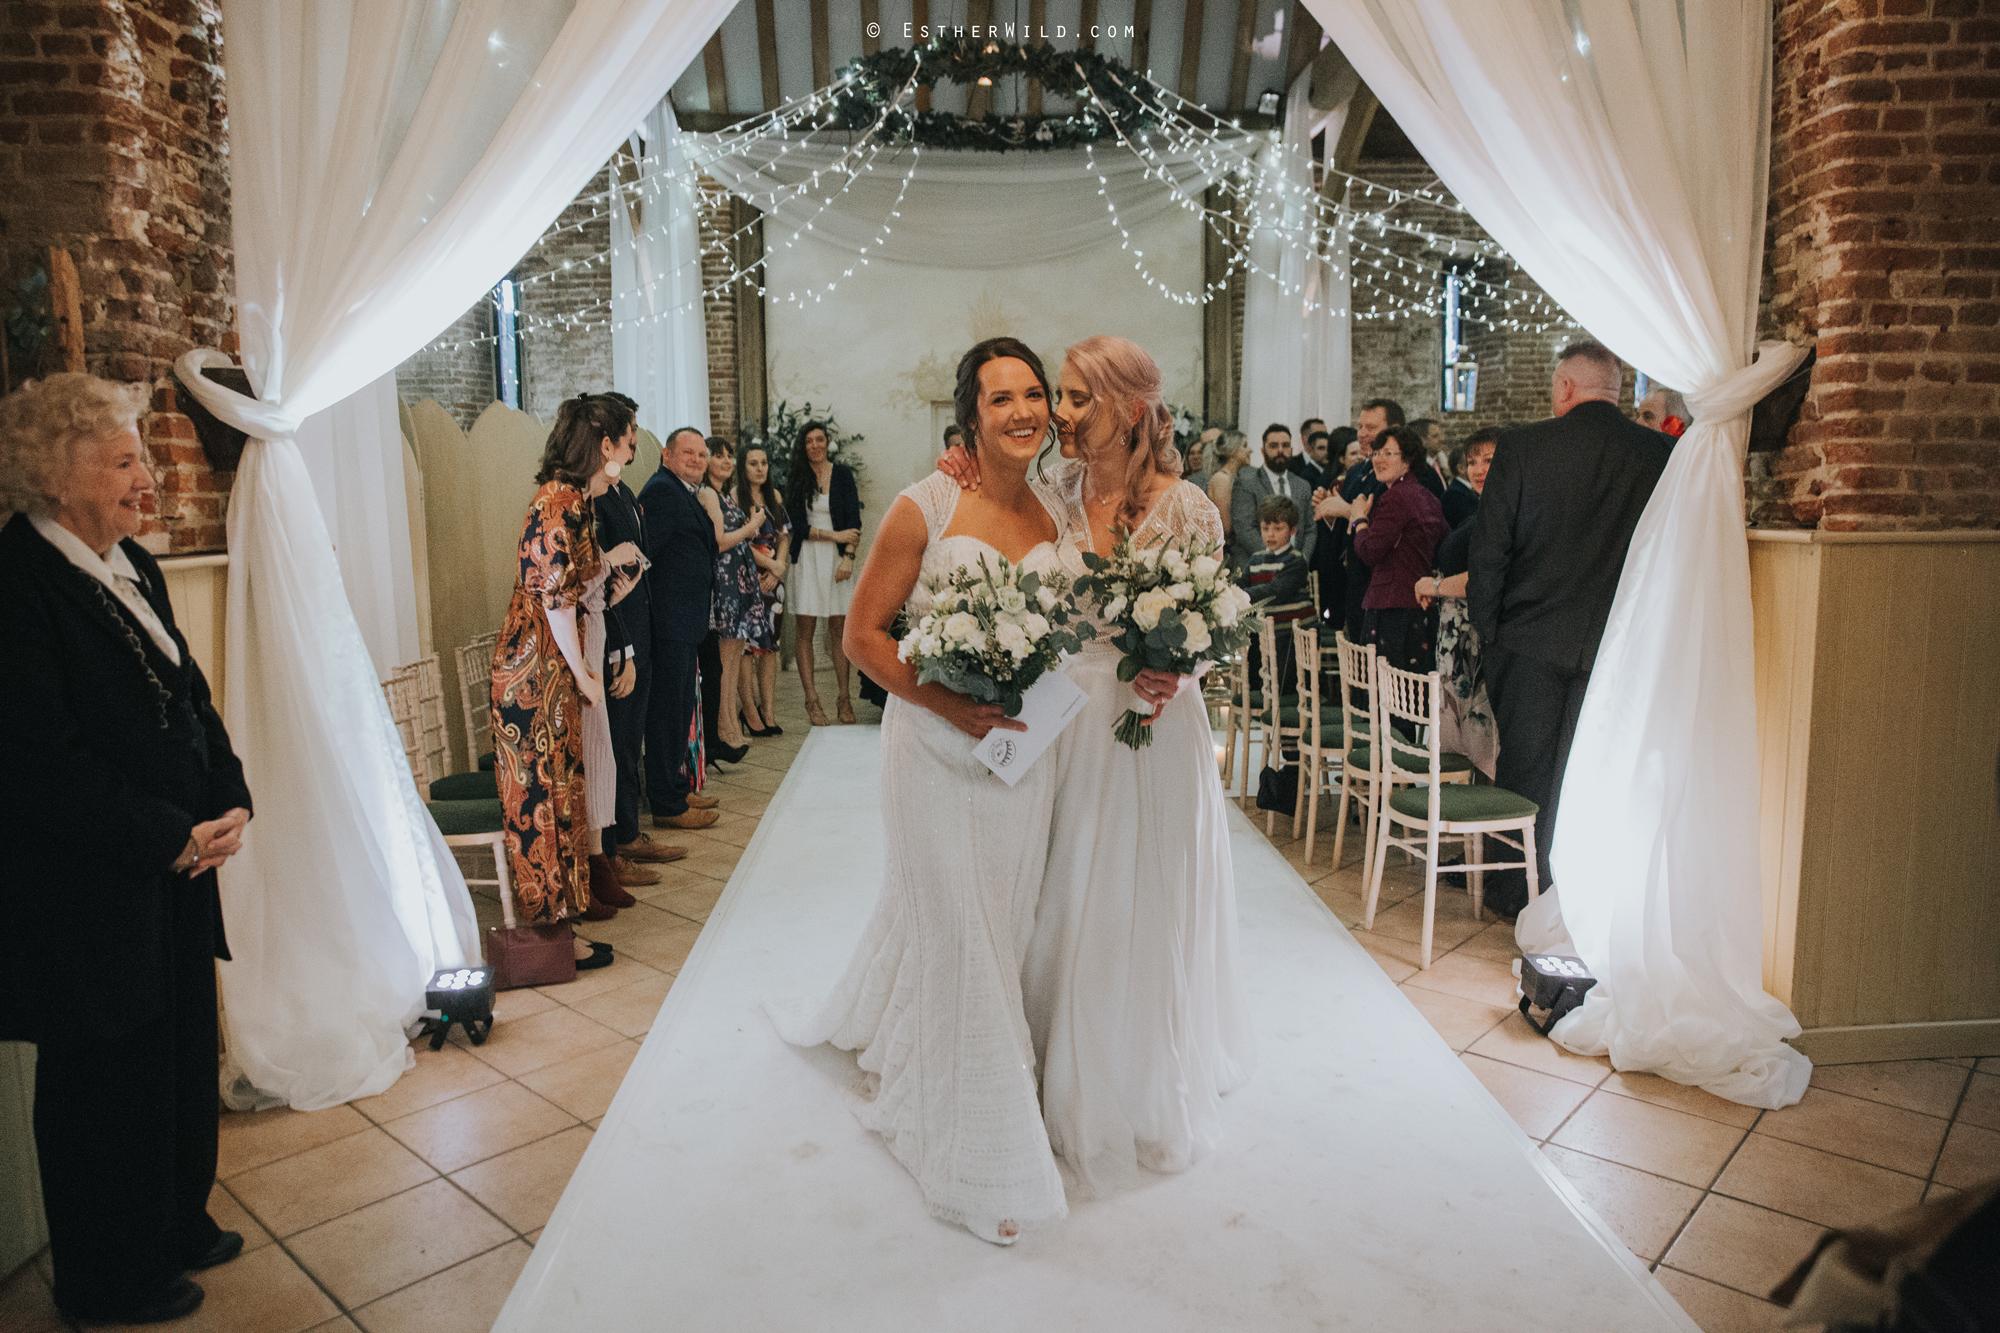 Elms_Barn_Weddings_Suffolk_Photographer_Copyright_Esther_Wild_IMG_1408.jpg